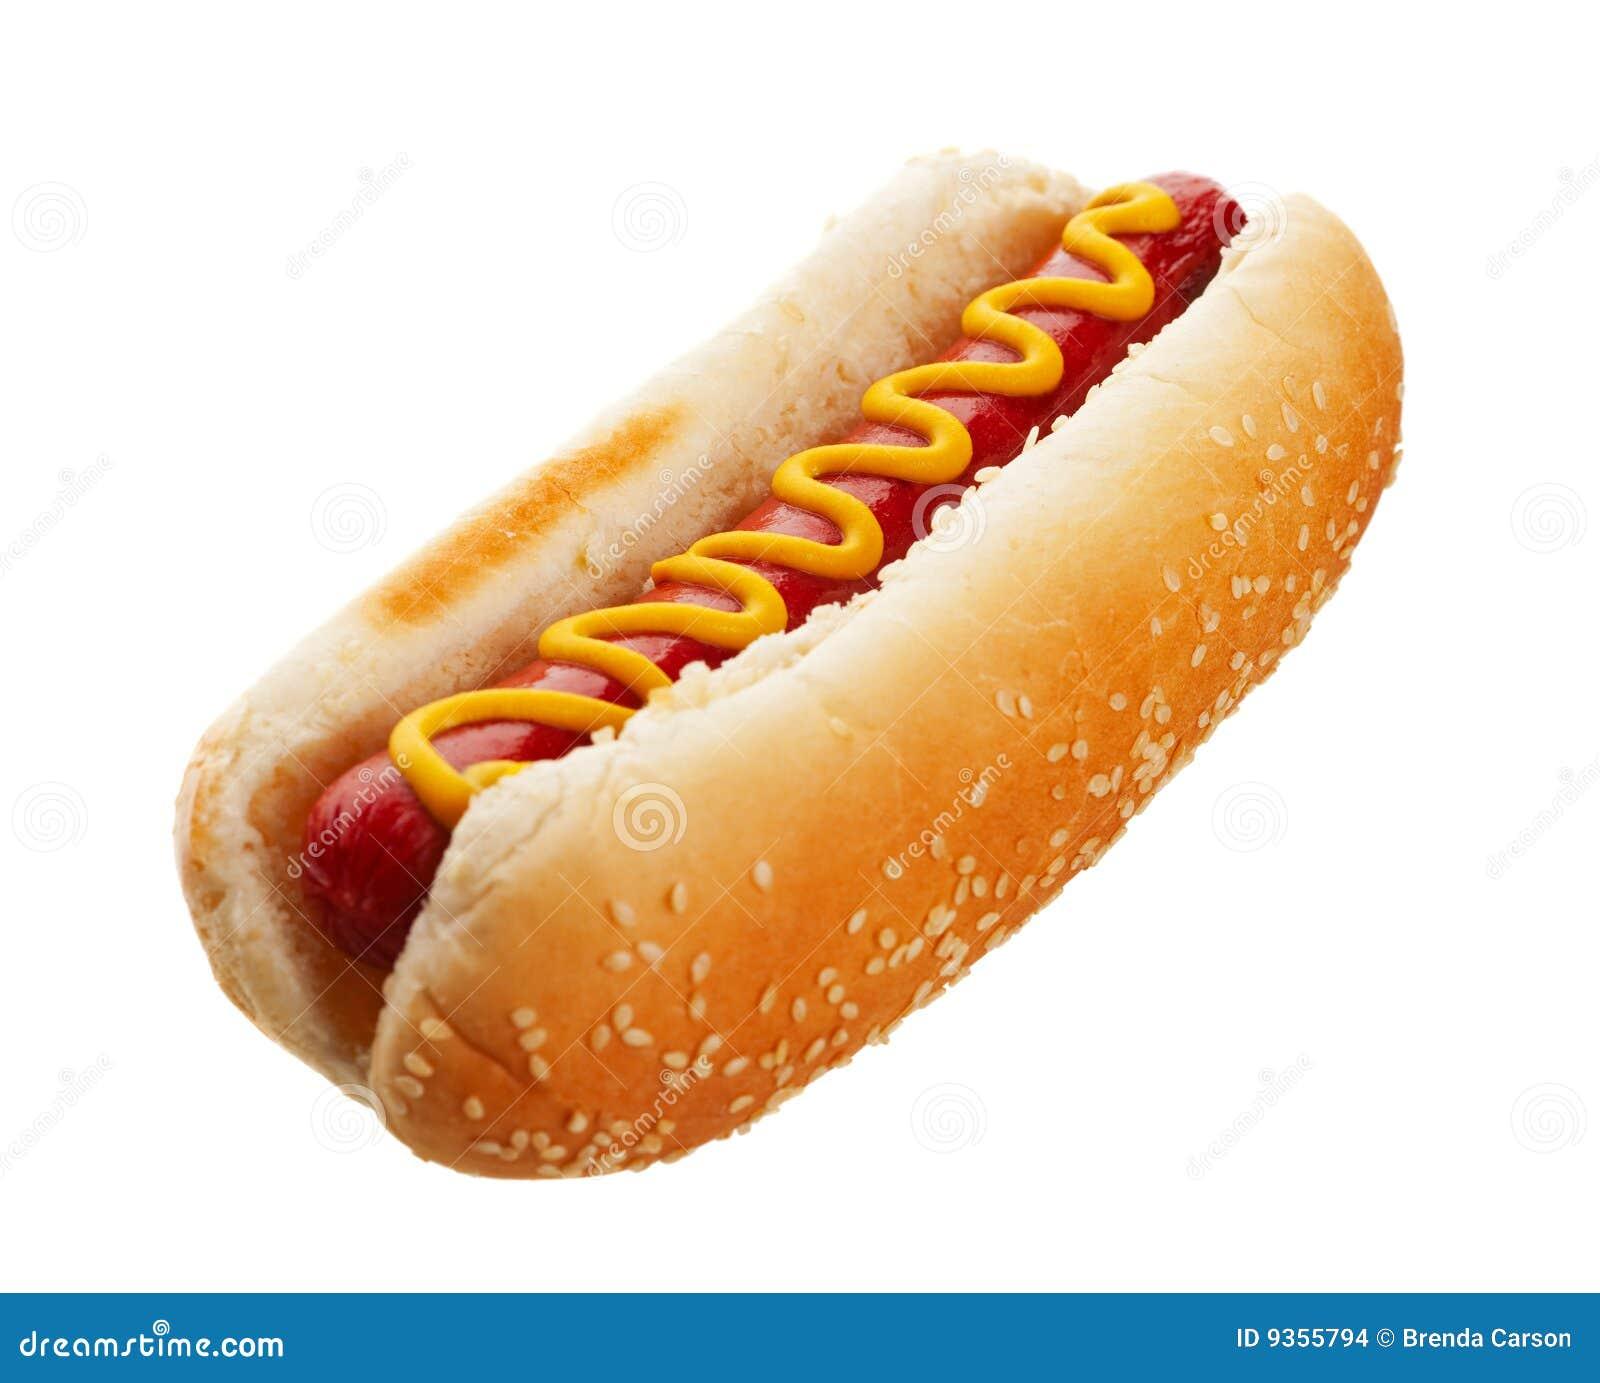 hot dog with mustard stock images image 9355794. Black Bedroom Furniture Sets. Home Design Ideas